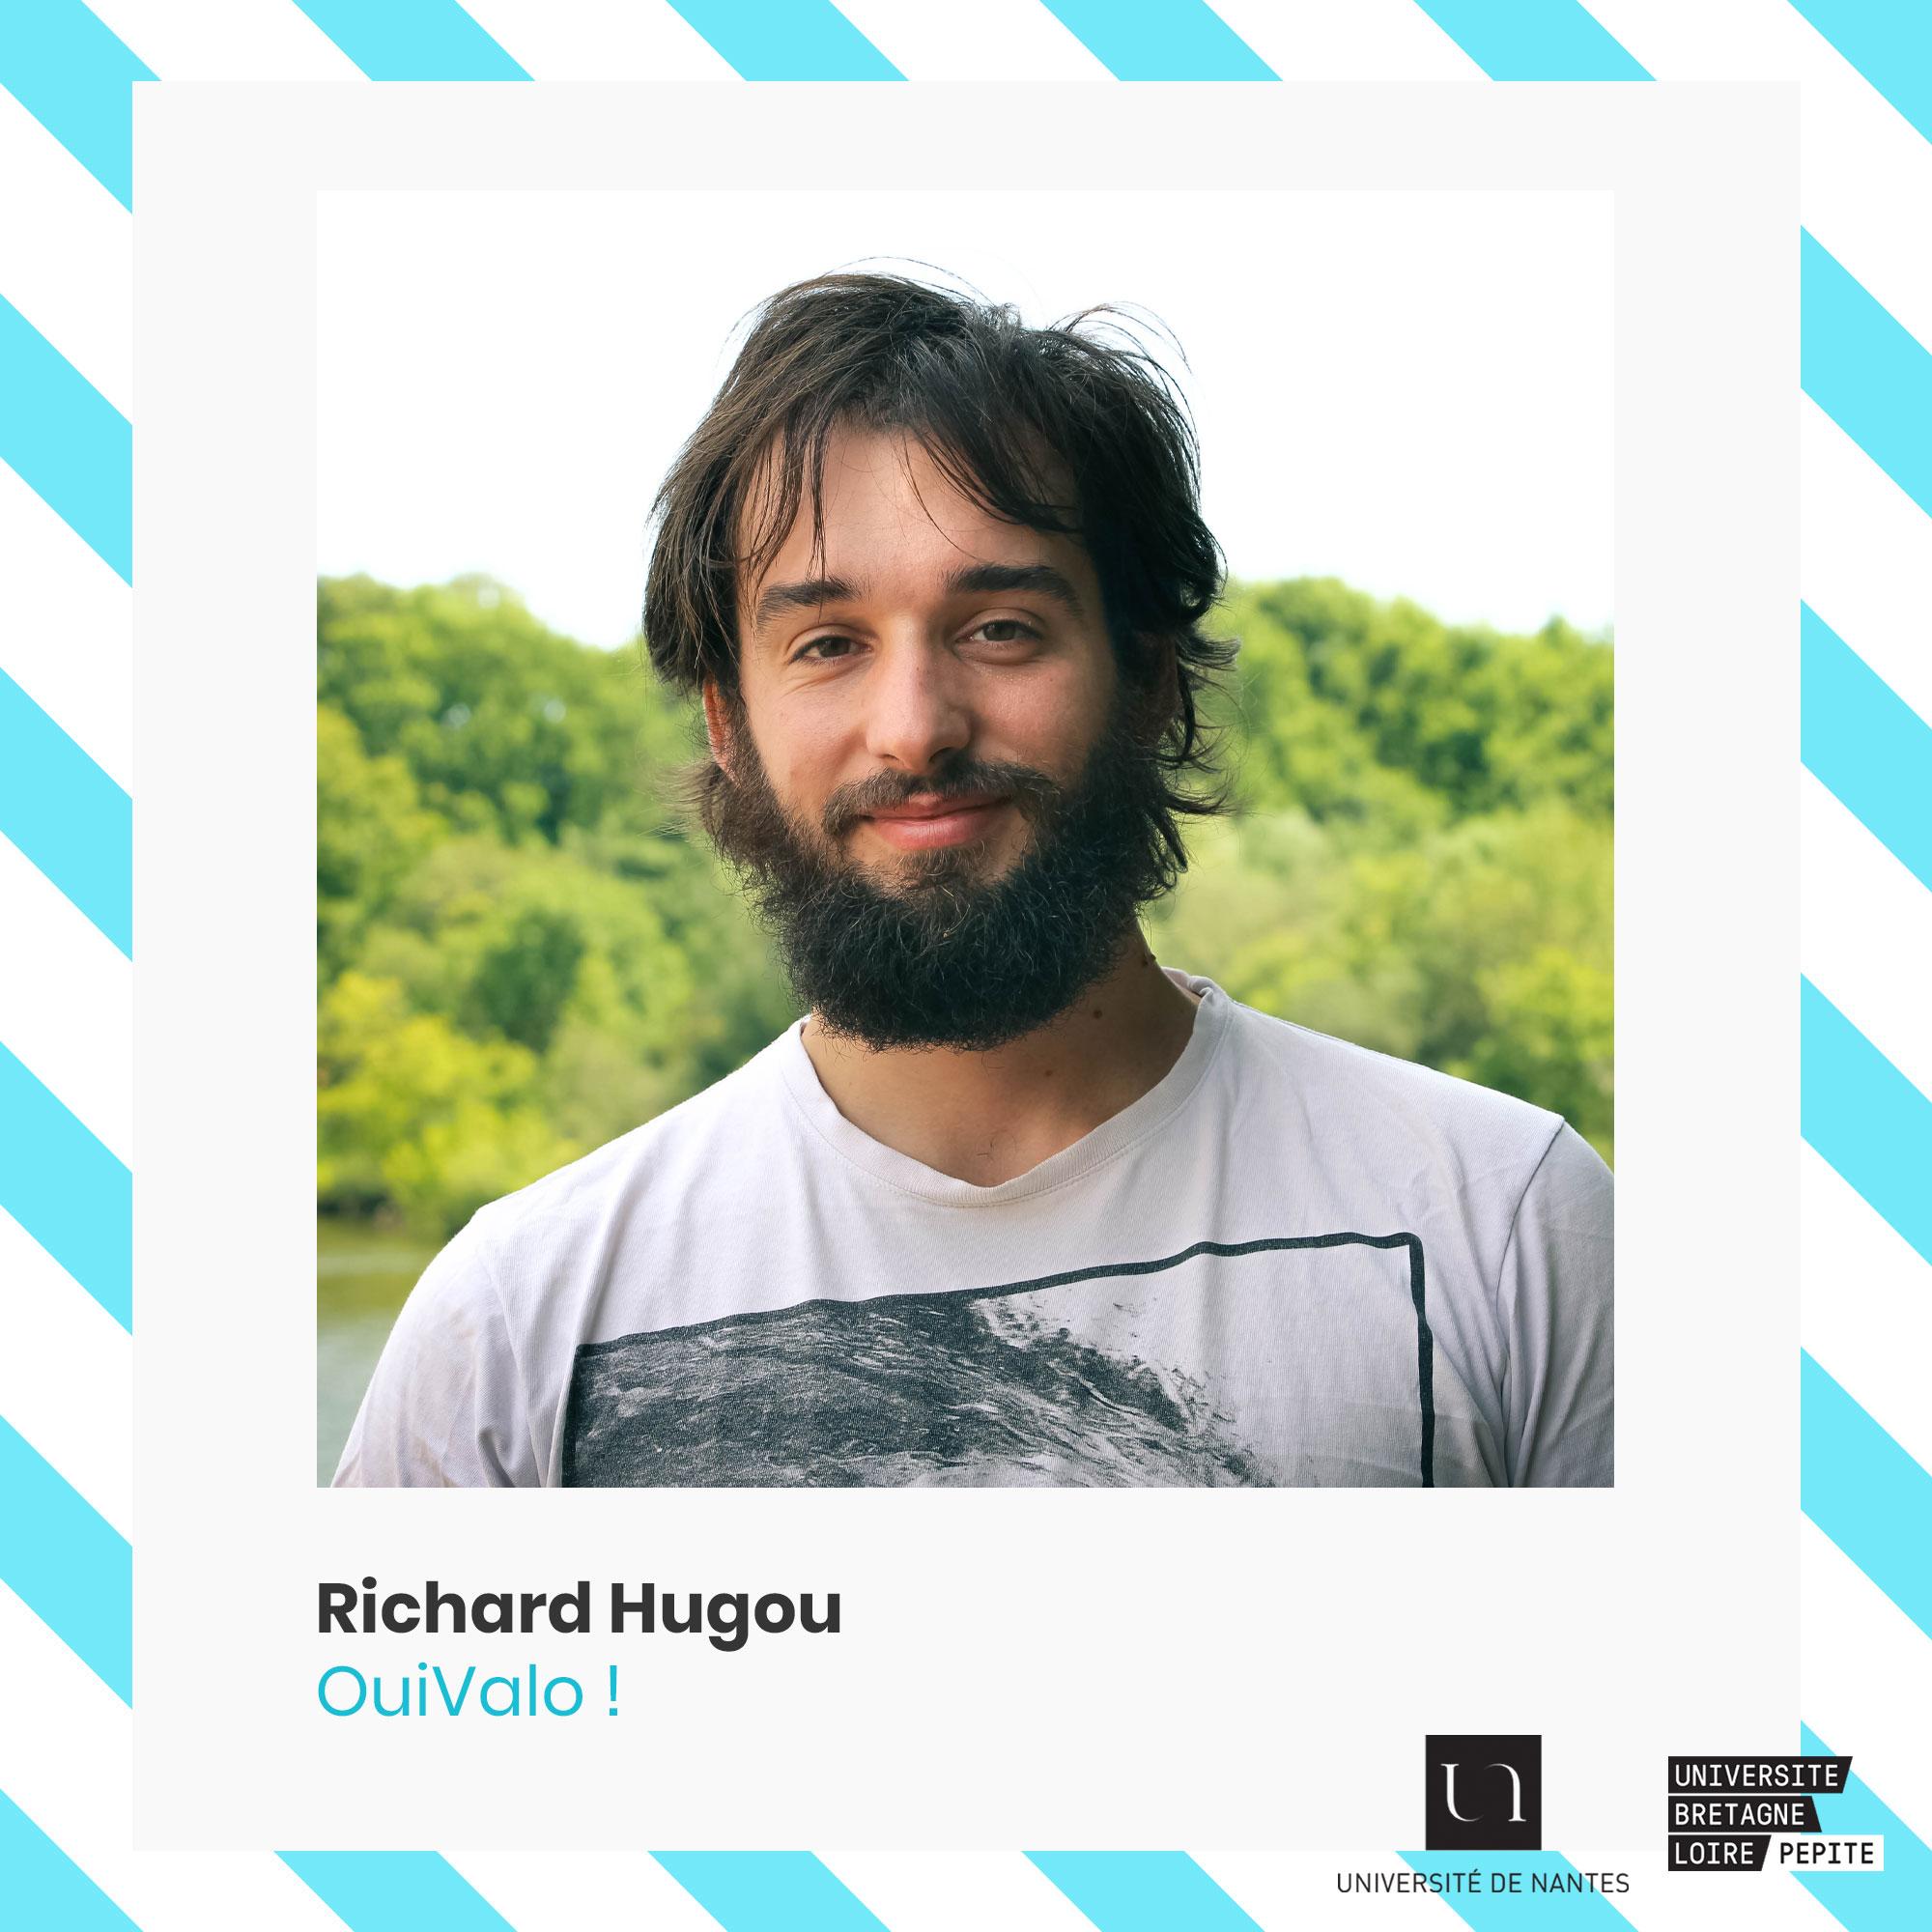 Richar Hugou - OuiVALO - entrepreneuriat-étudiant - Université de Nantes